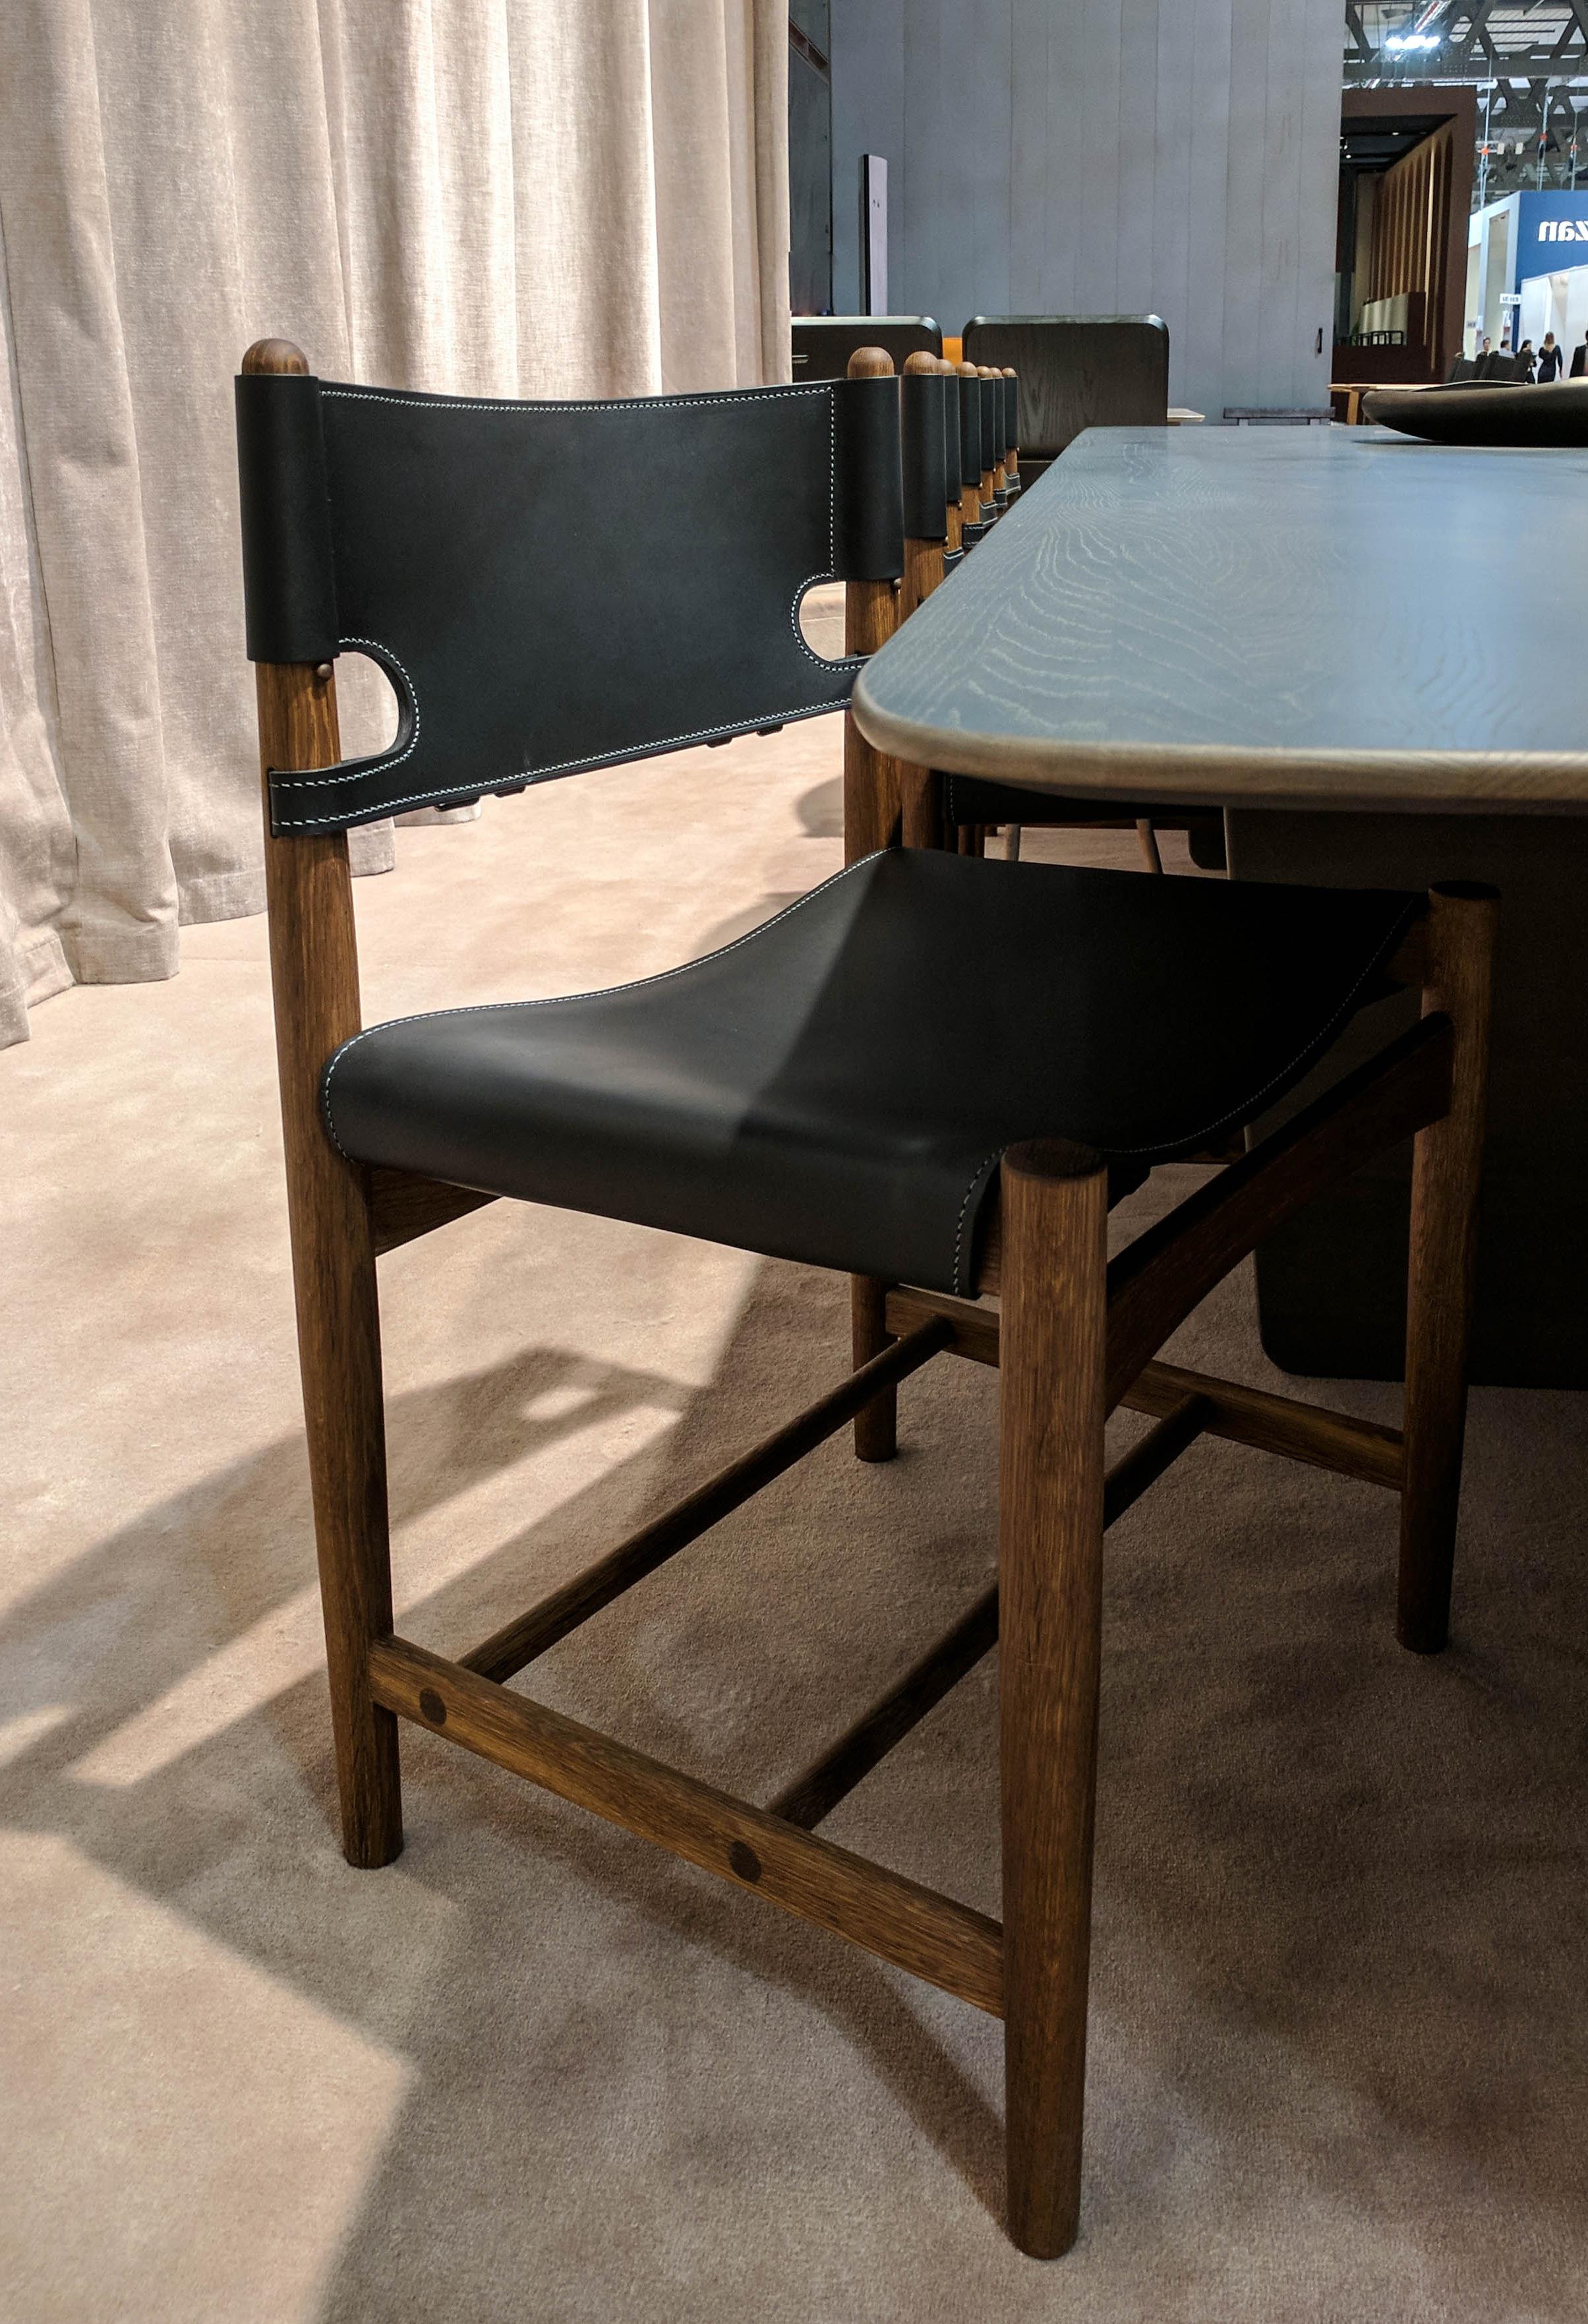 - Spanish dinning chair